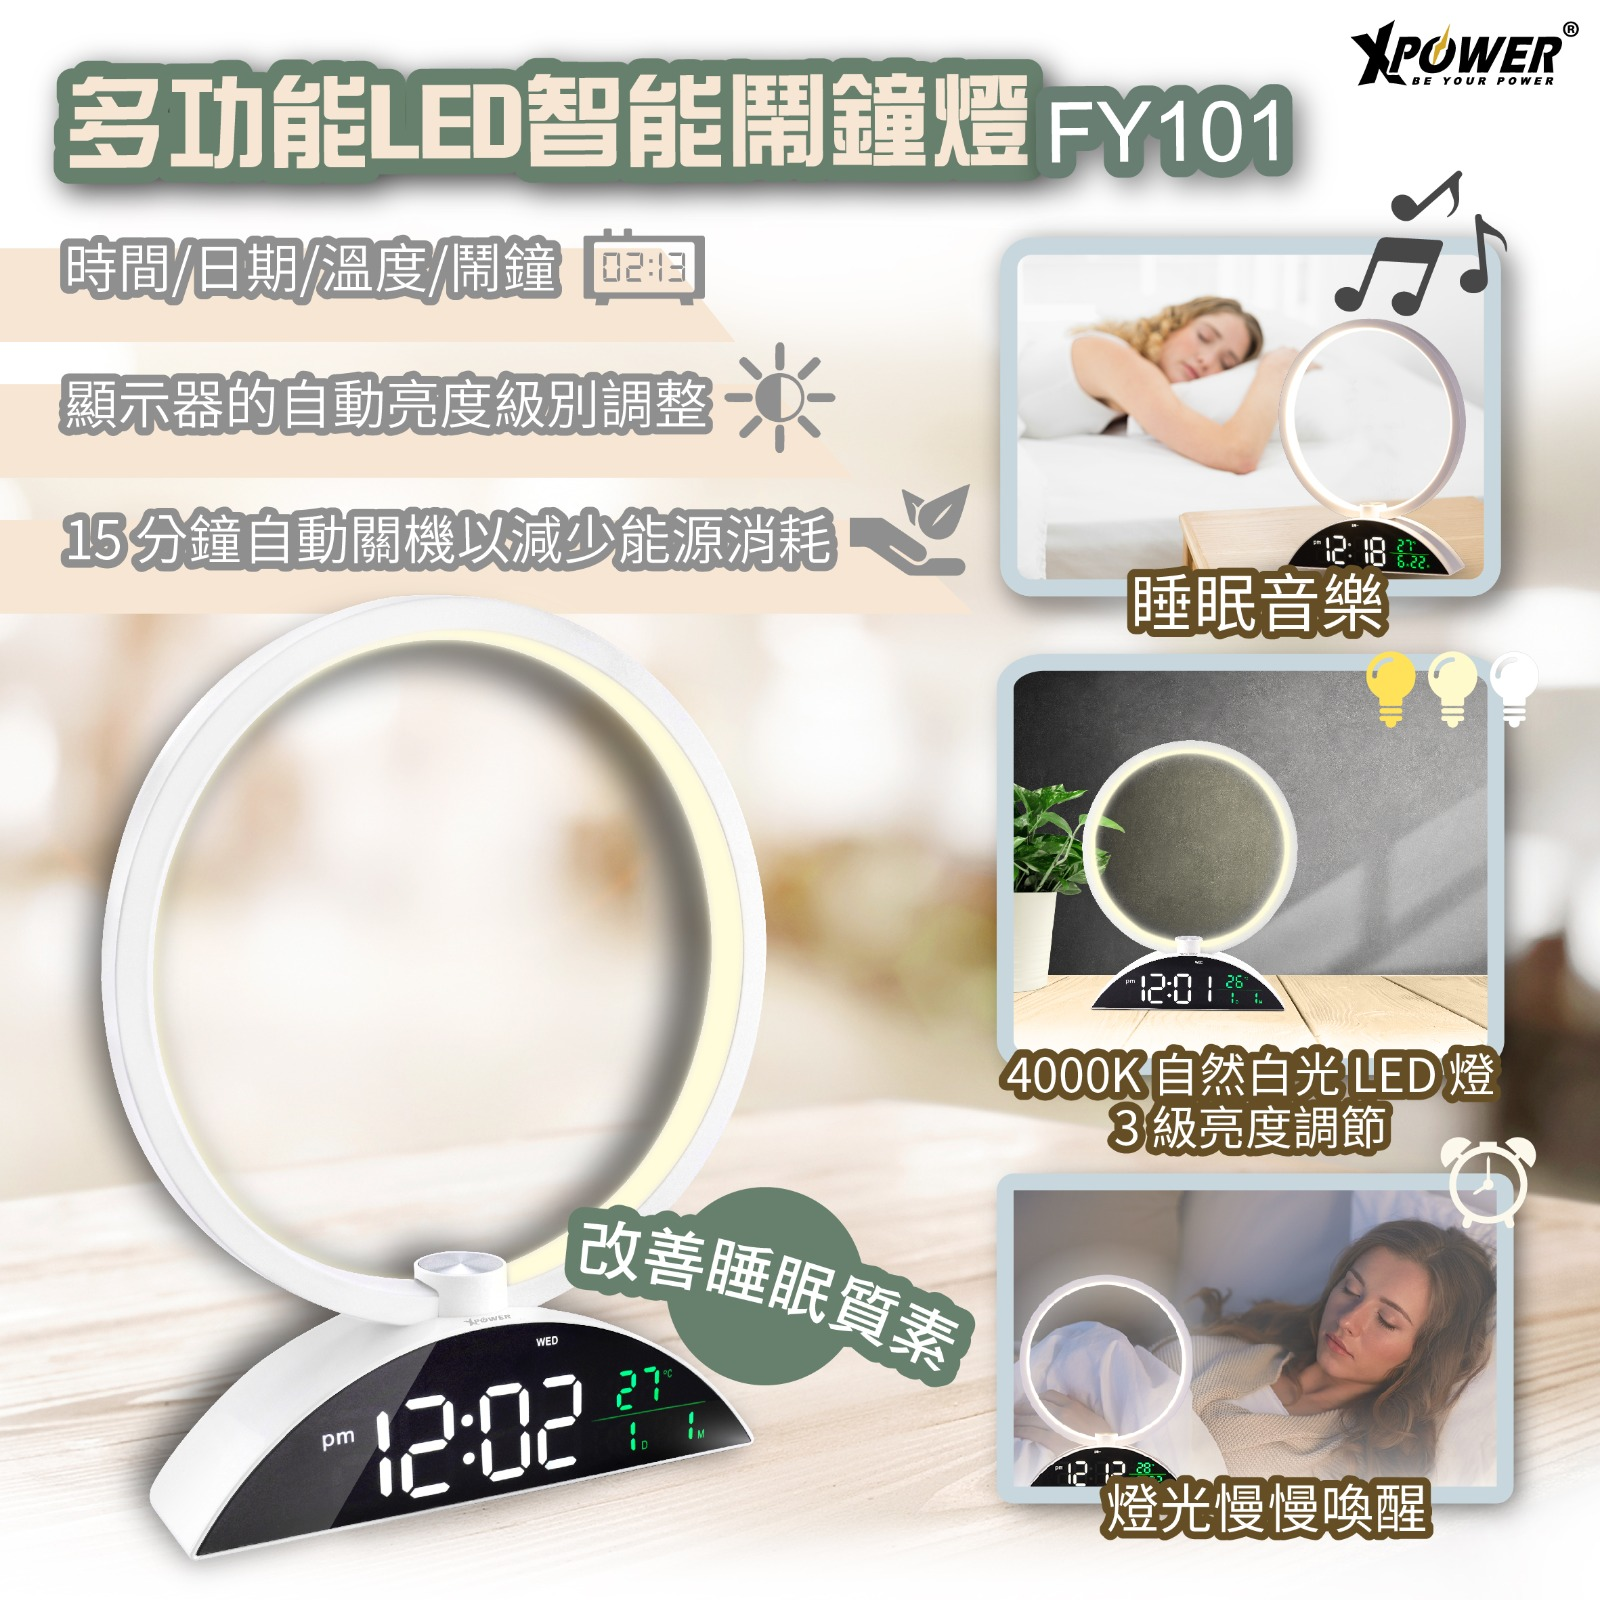 XPower FY101 多功能LED智能鬧鐘燈